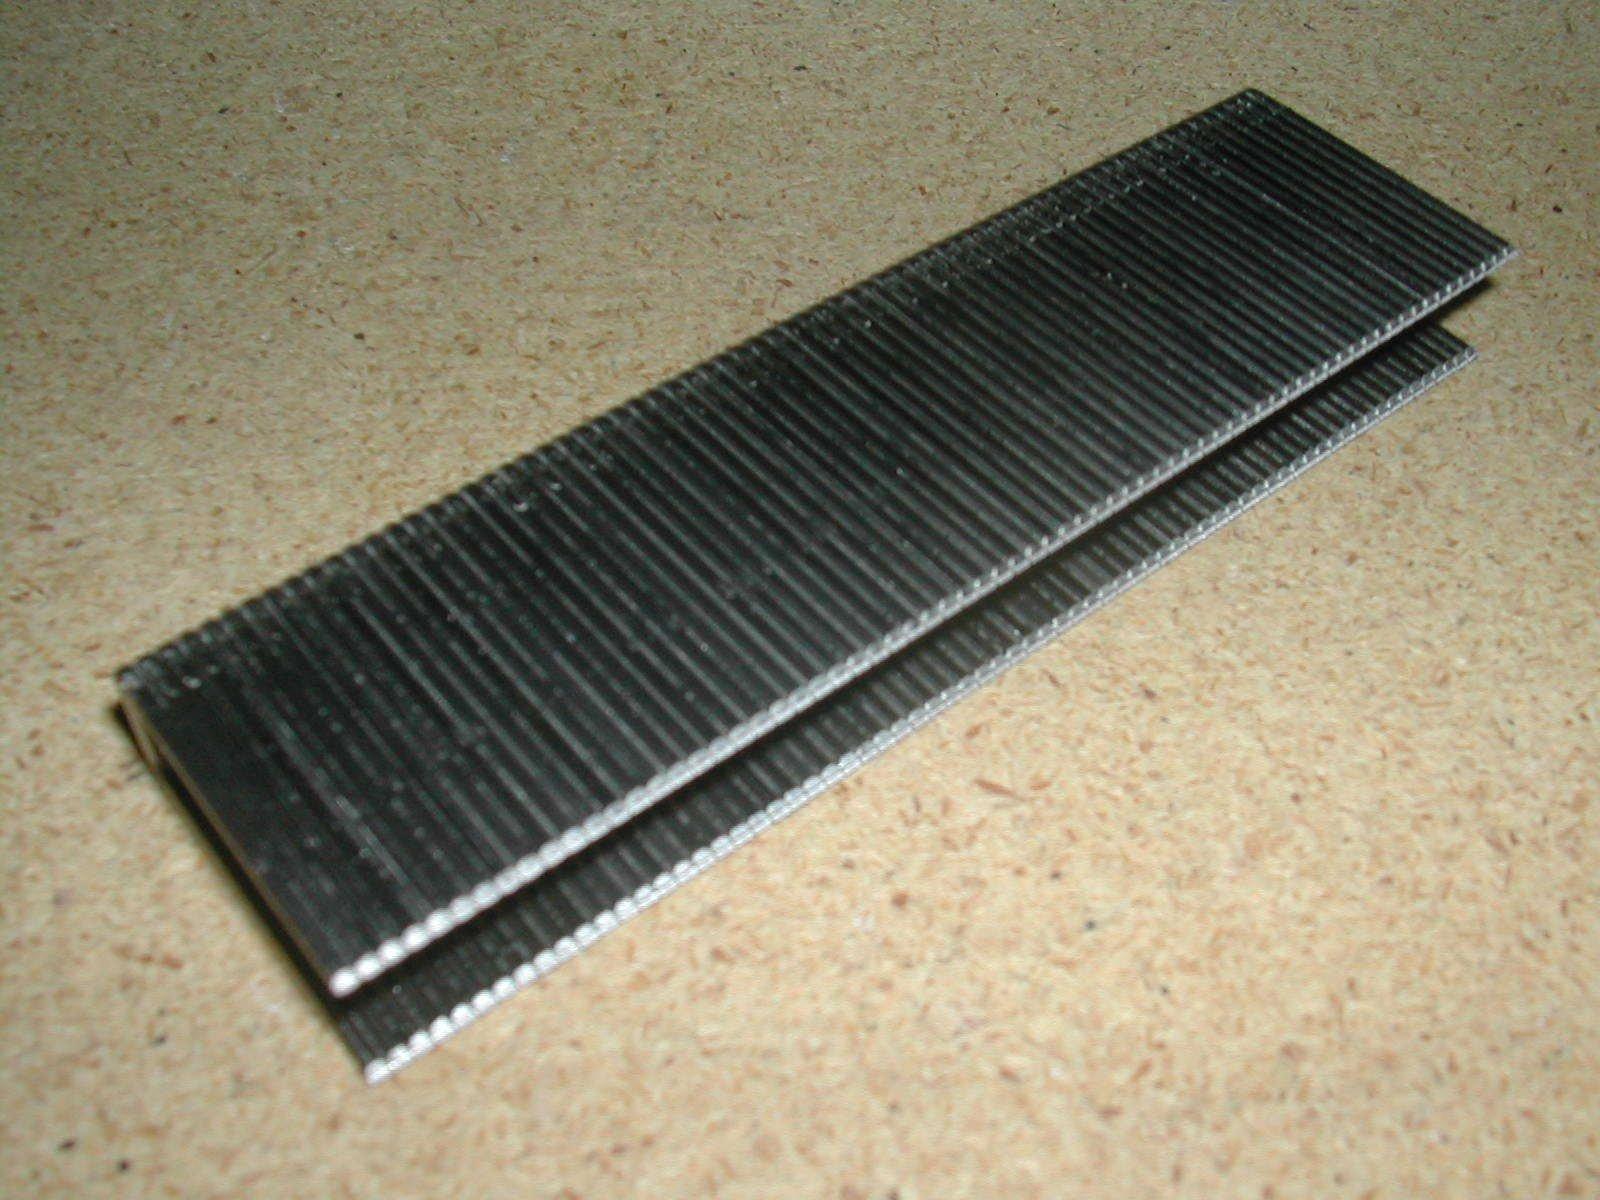 Spot Nails 6610PS-10M 7/16-Inch Crown 1-1/4-Inch 16-Gauge Leg Sheathing Staples